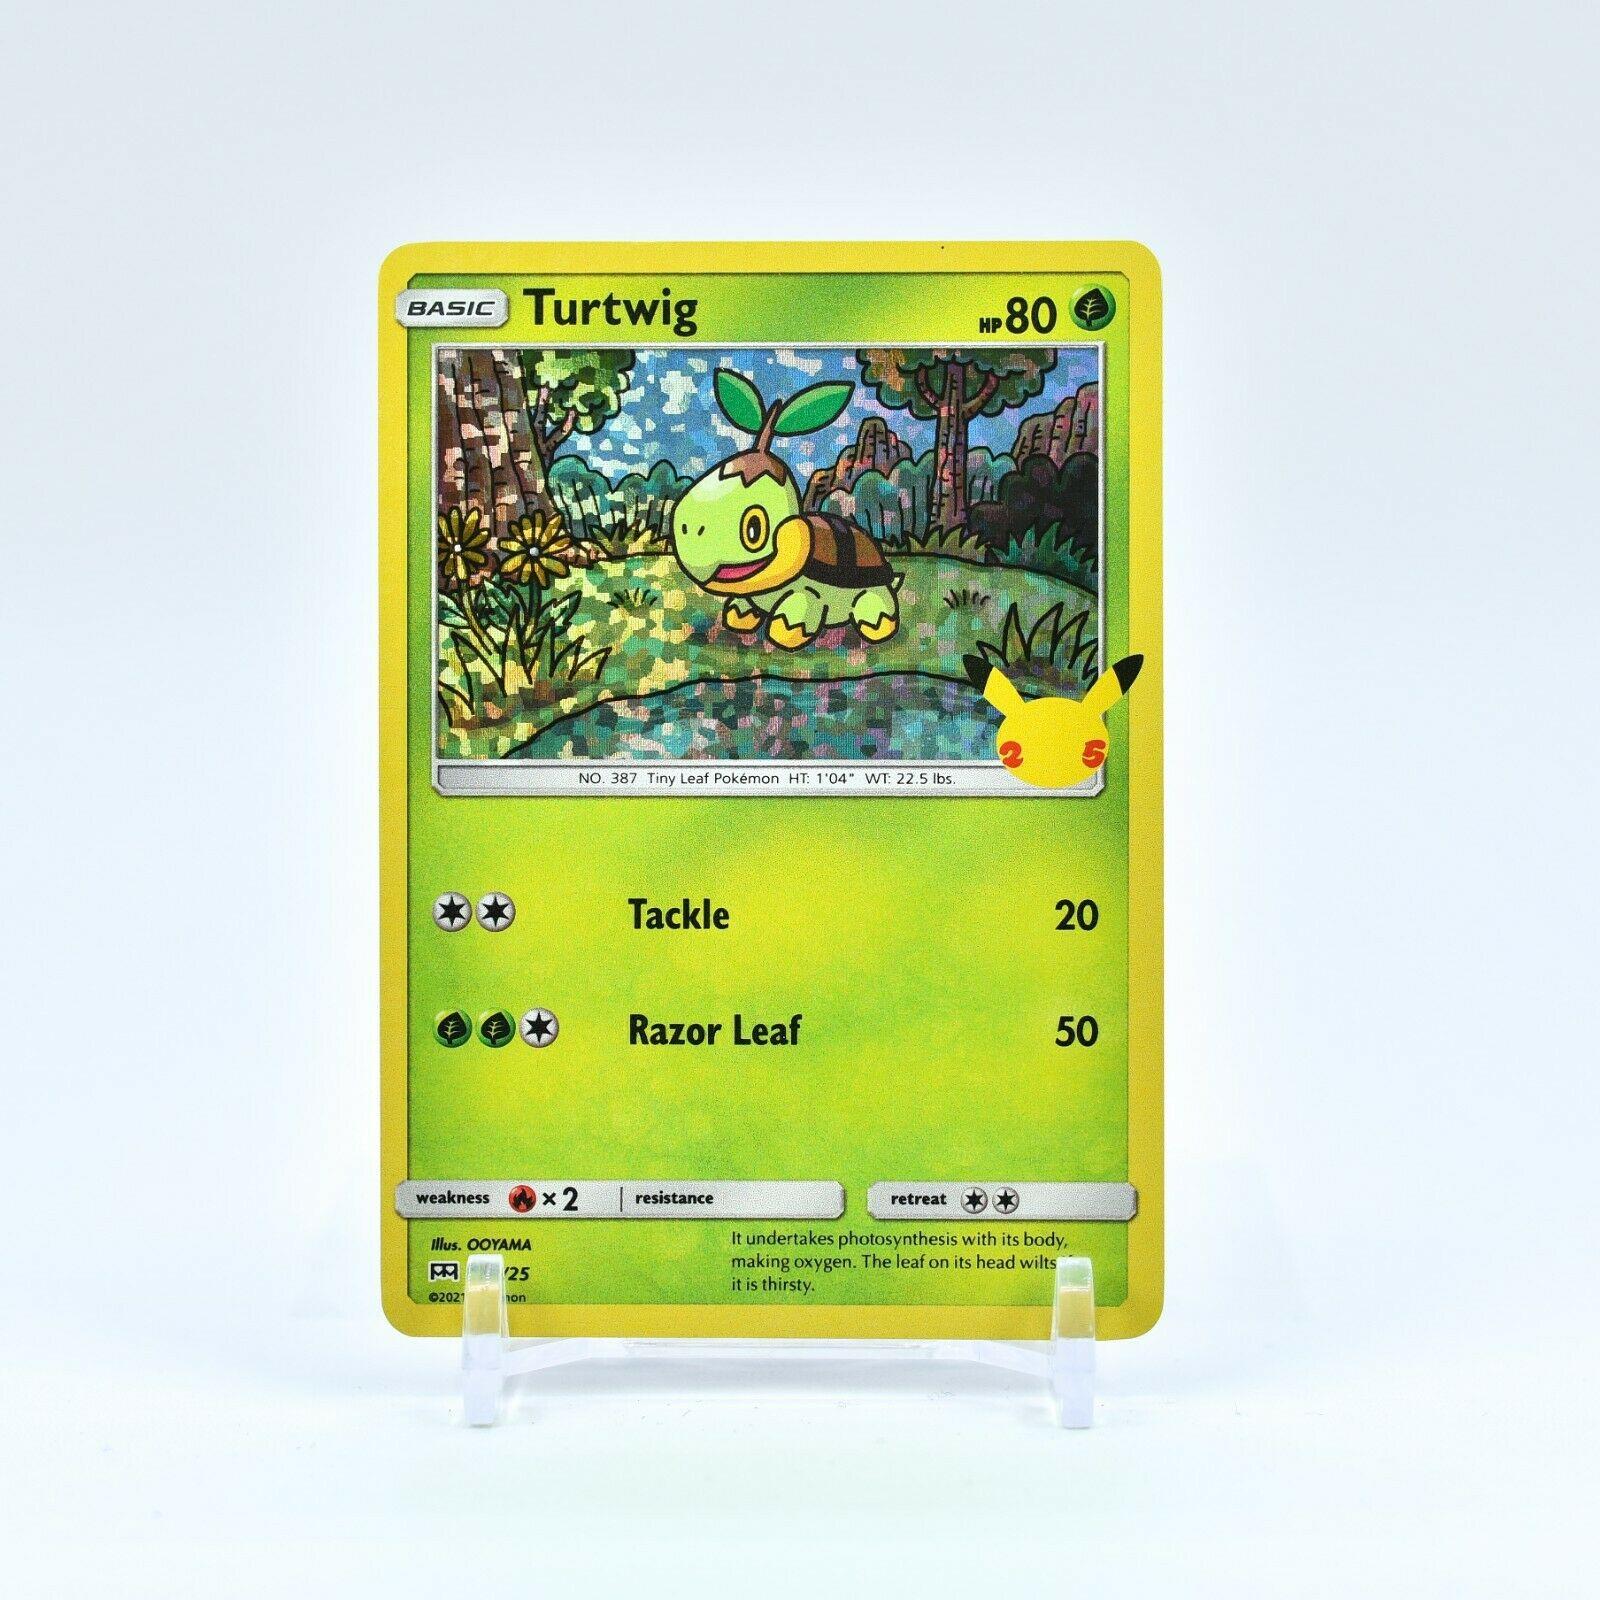 Turtwig - 4/25 Mcdonald's 25th Anniversary Holo Starter Pokemon - NM/MINT